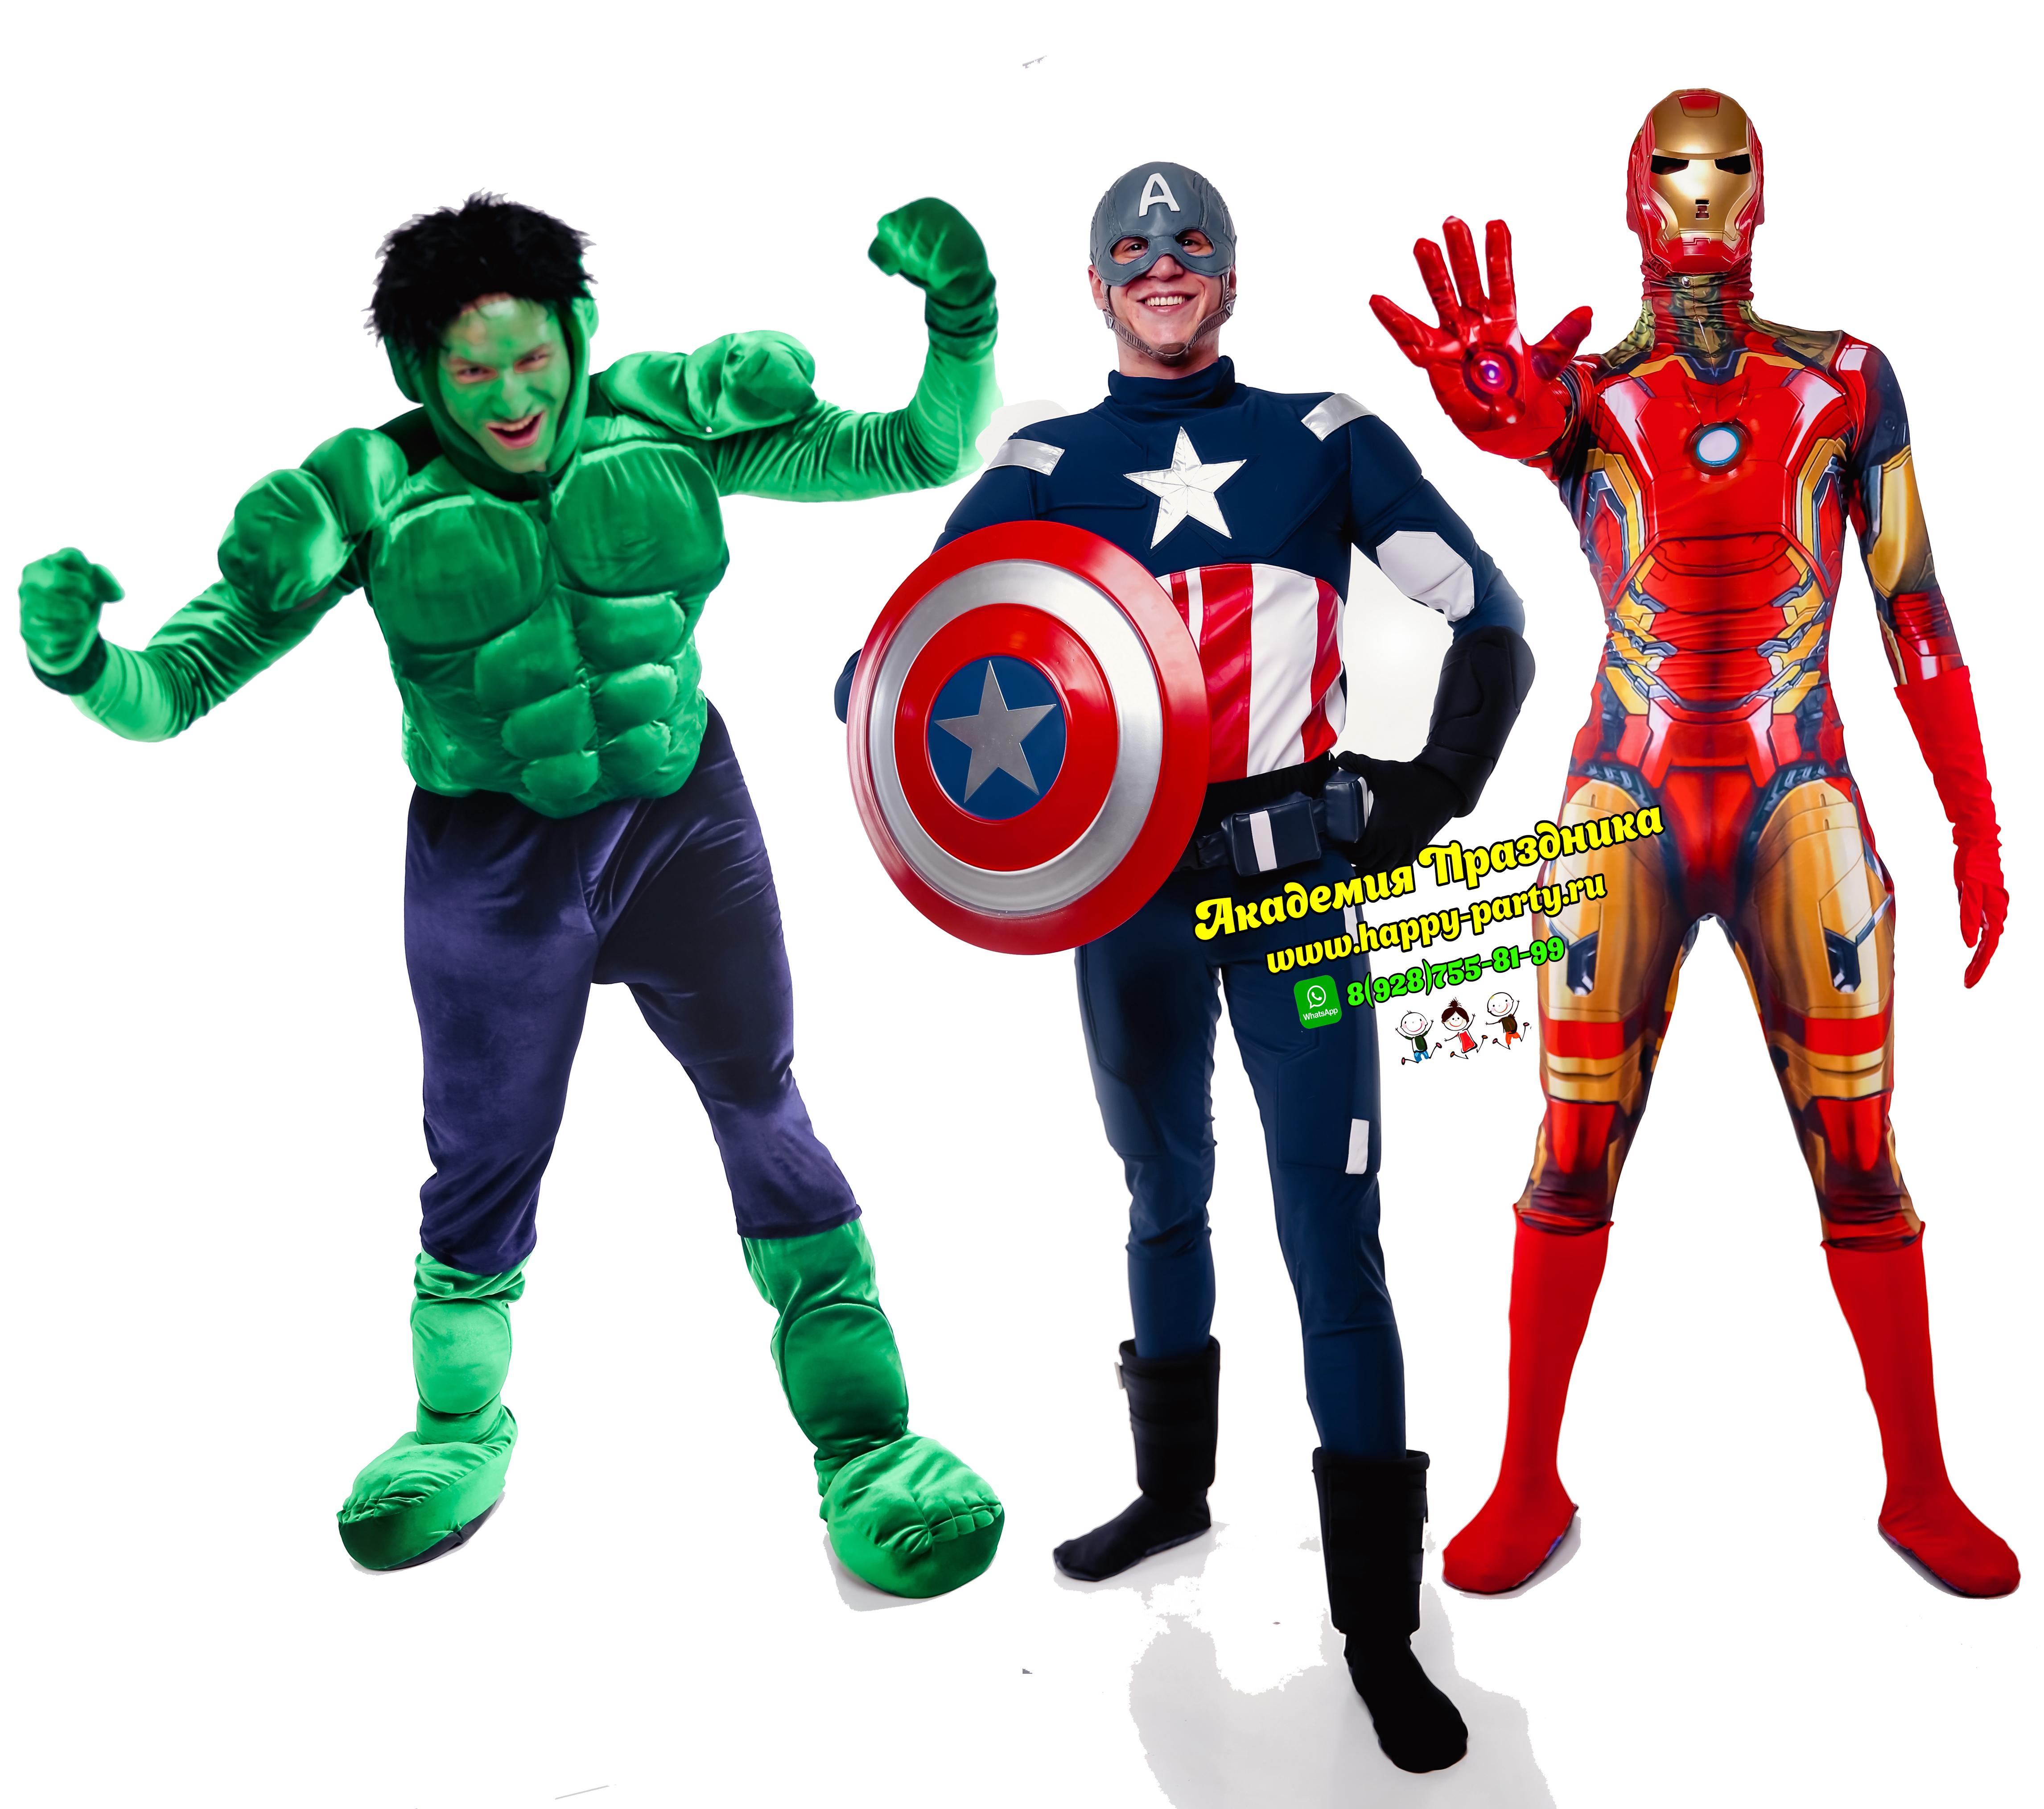 Аниматоры мстители халк железный человек капитан америка супергерои на праздник